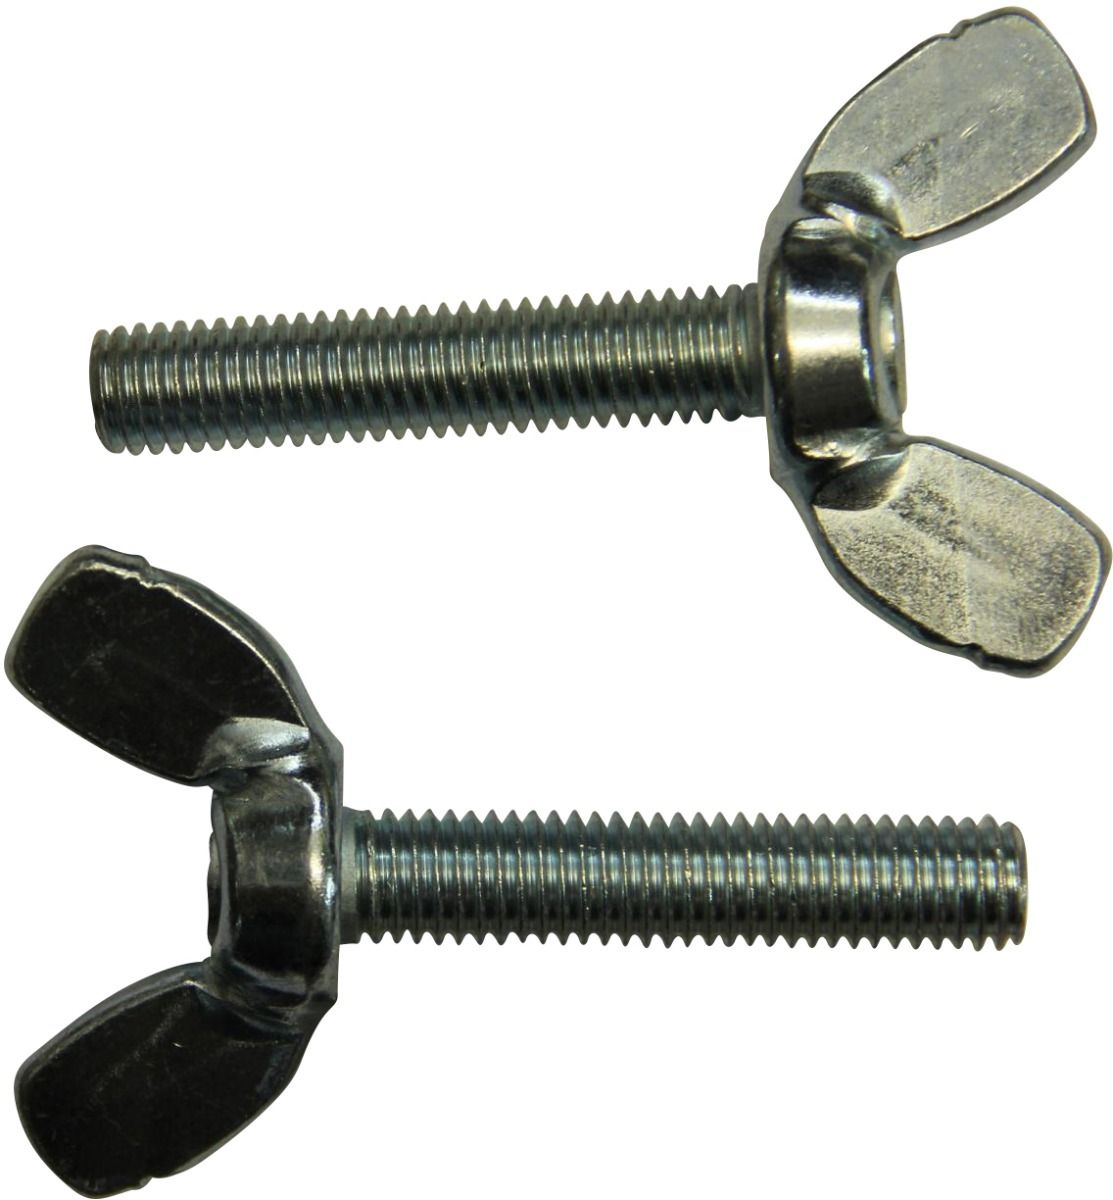 Wing screw